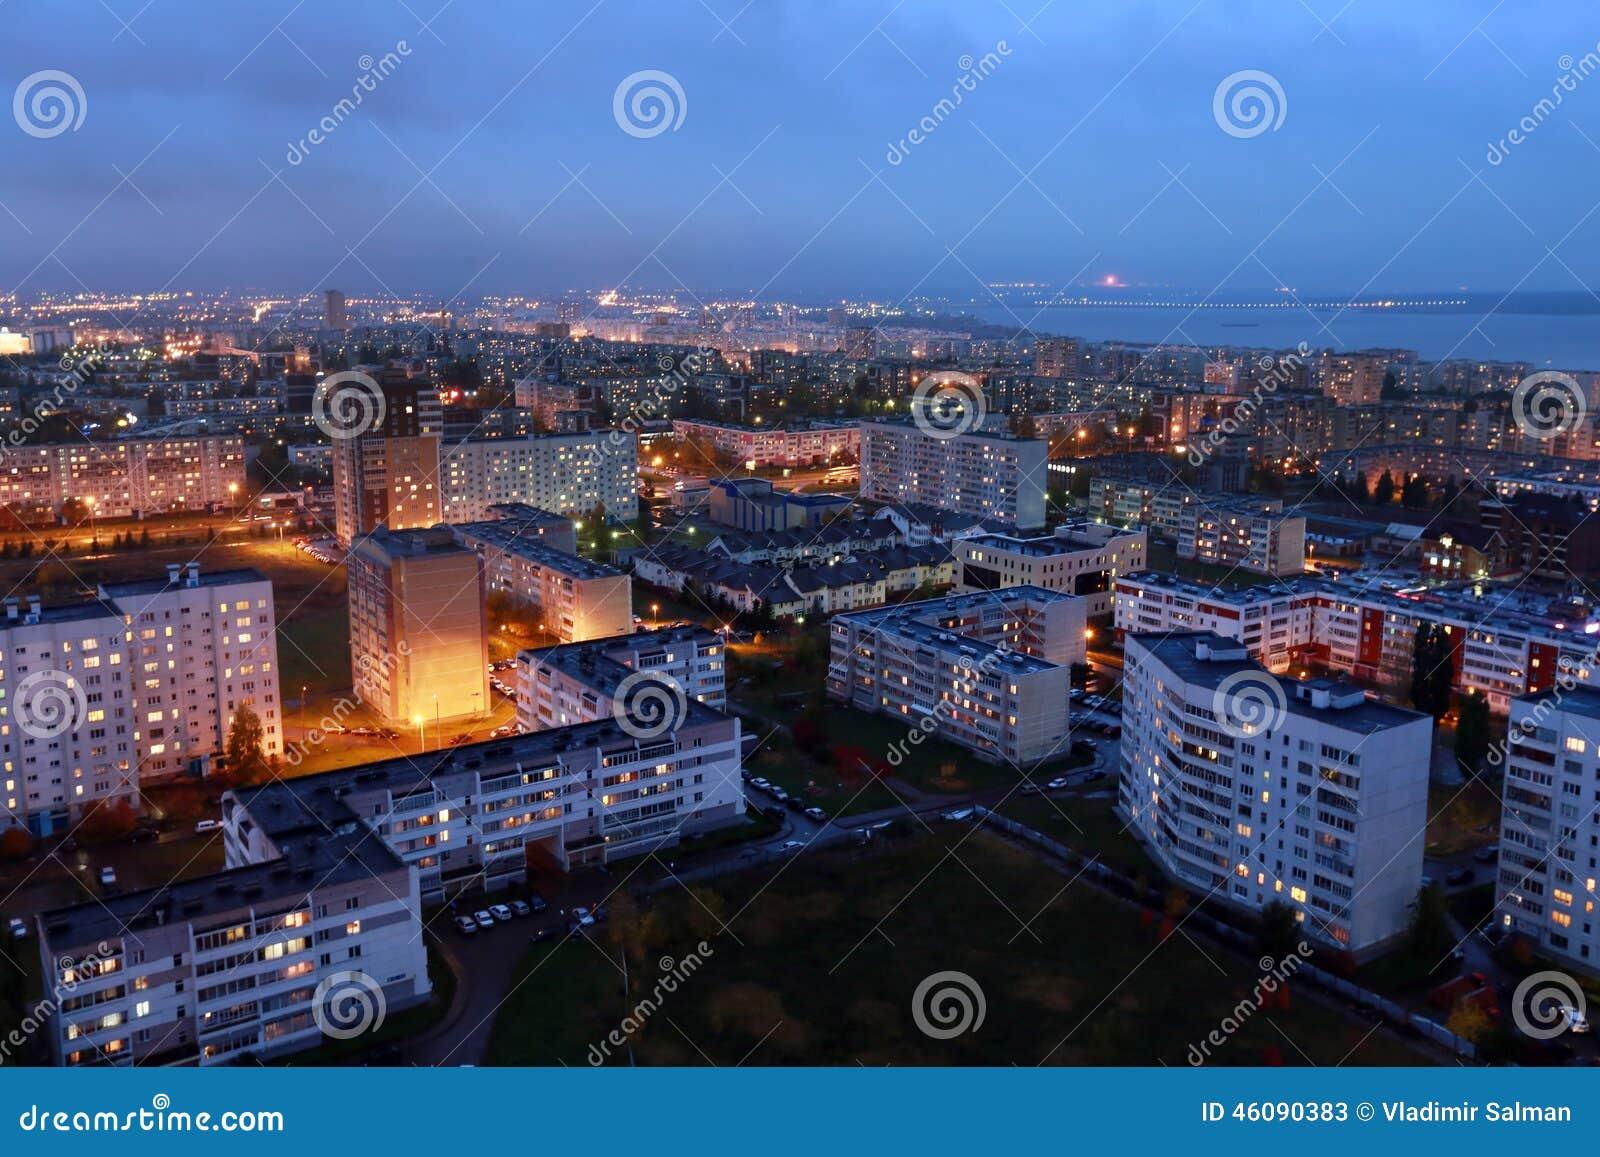 Download Naberezhnye Chelny, Russia - October 7, 2014: City night L Stock Image - Image of downtown, area: 46090383